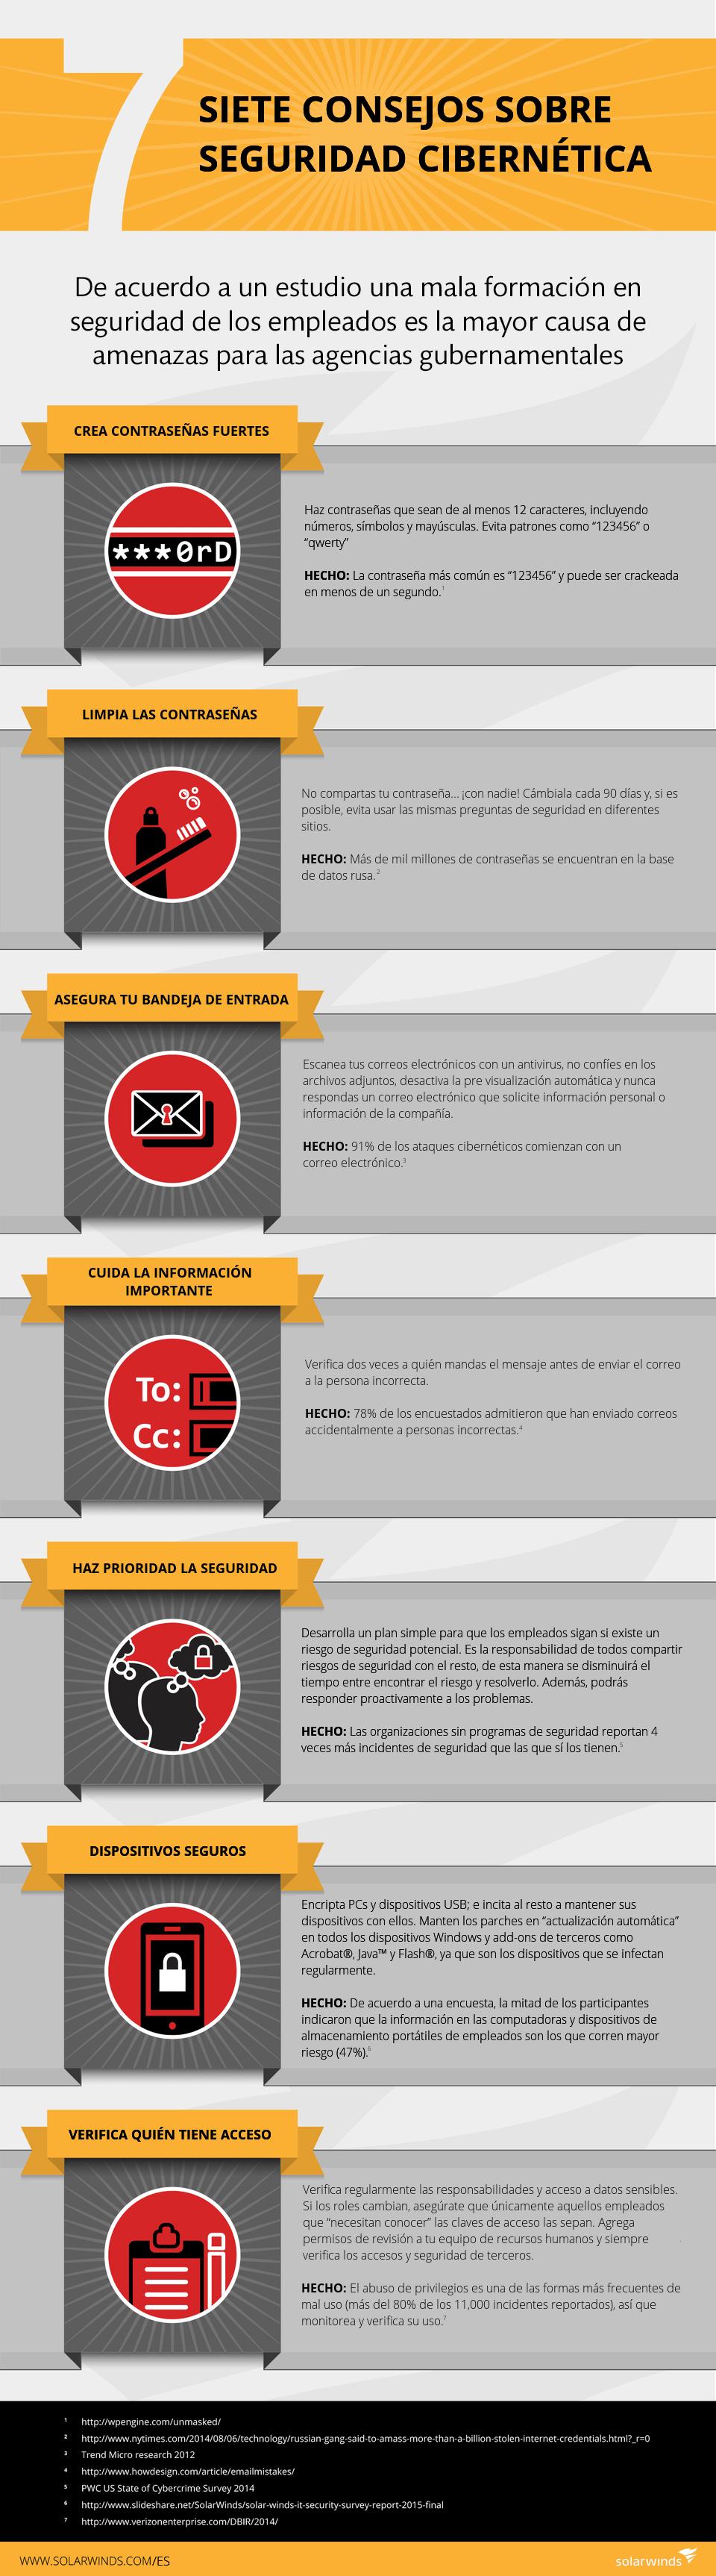 Interesante infografia sobre seguridad digital